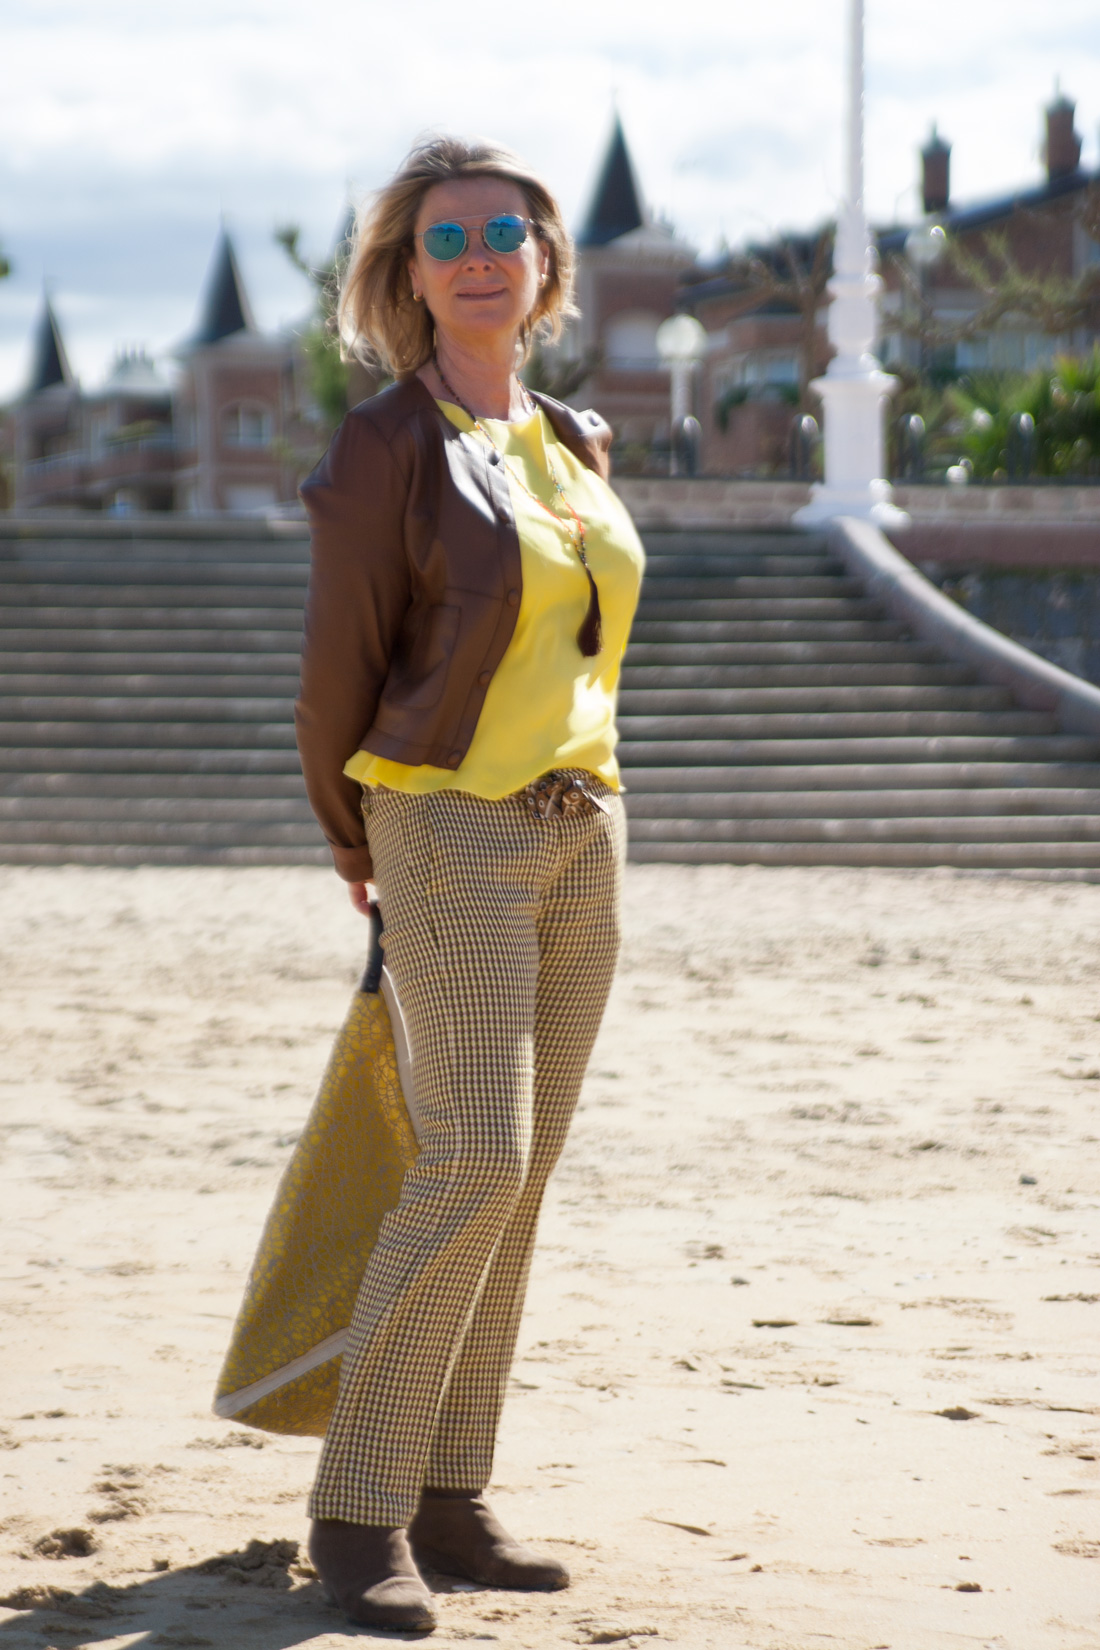 ASUNTA LARRINAGA, guía turística, posando con prendas del comercio OCRE.